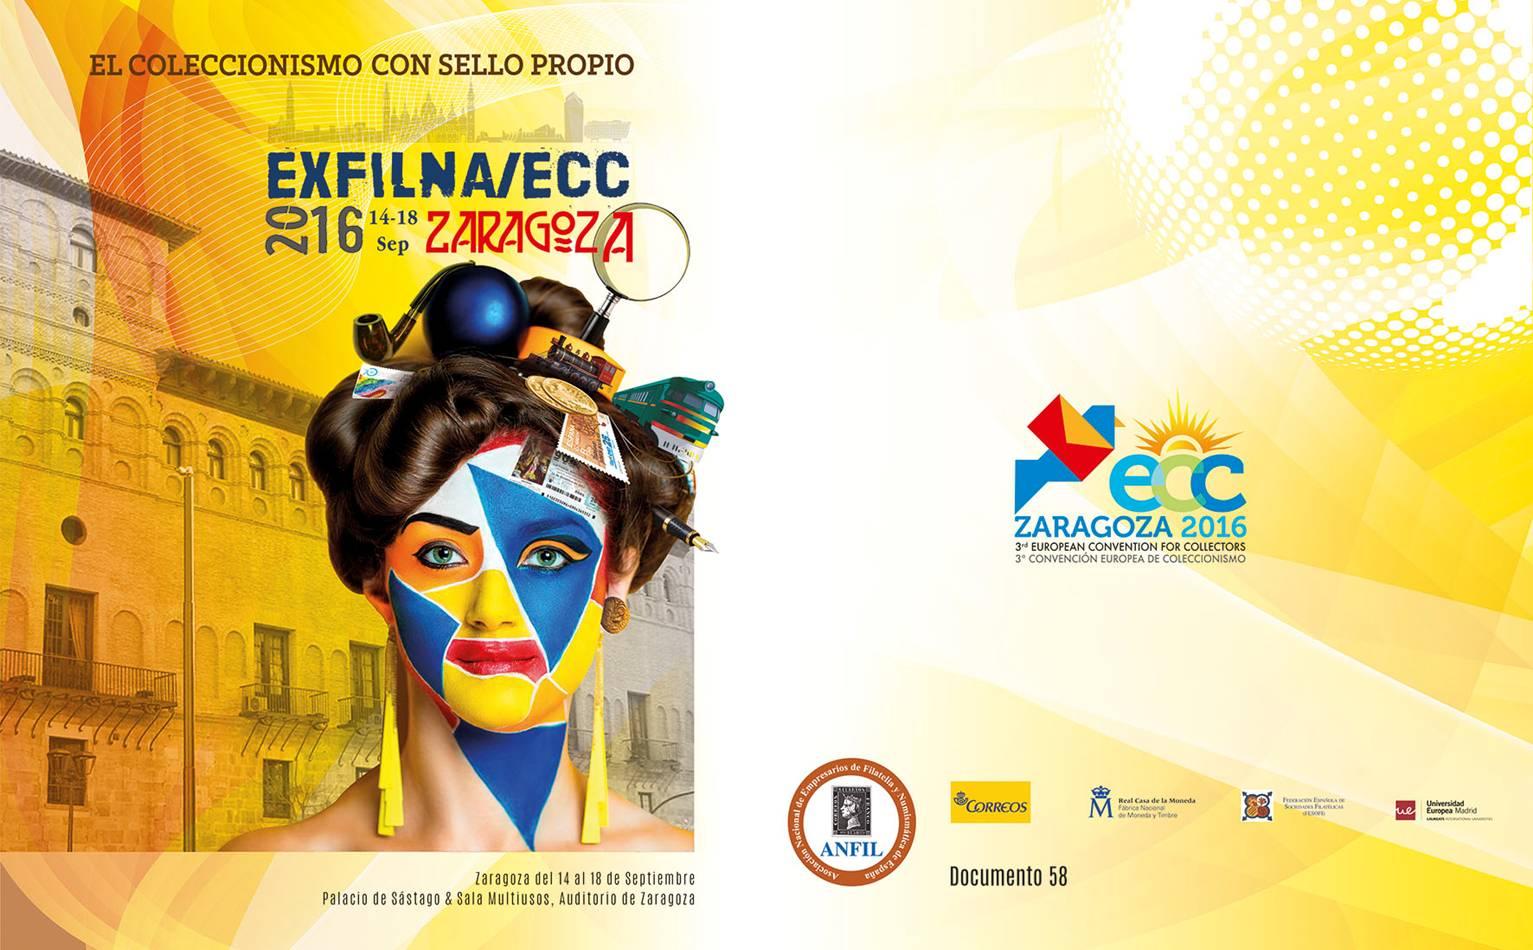 2016. Documento Anfil. ECC Zaragoza